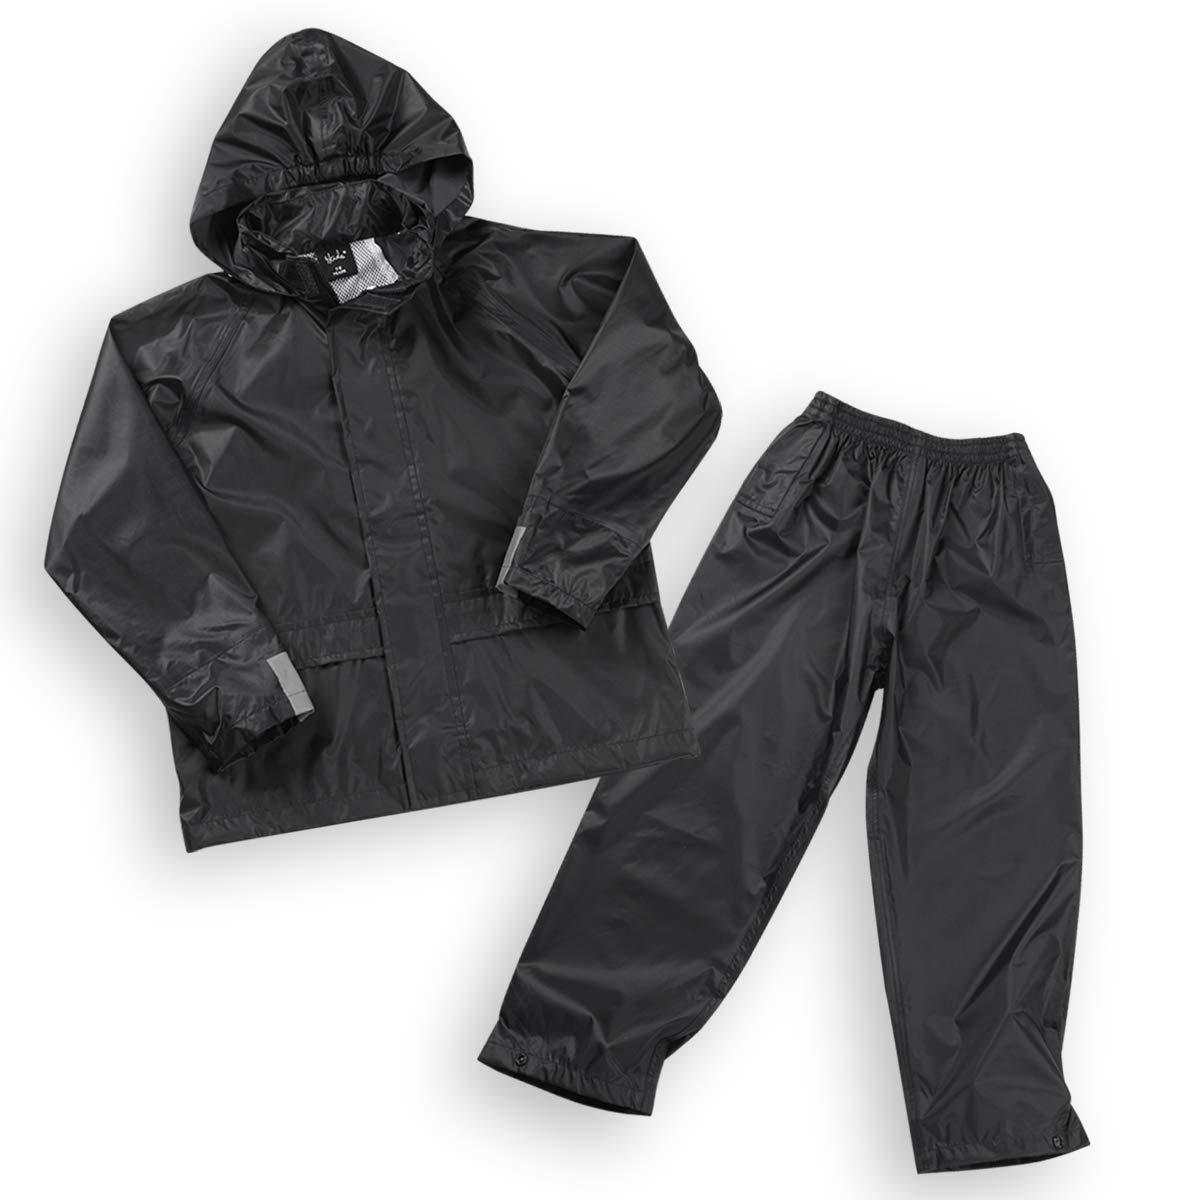 4 KIDZ Kids Waterproof Jacket and Trouser Set